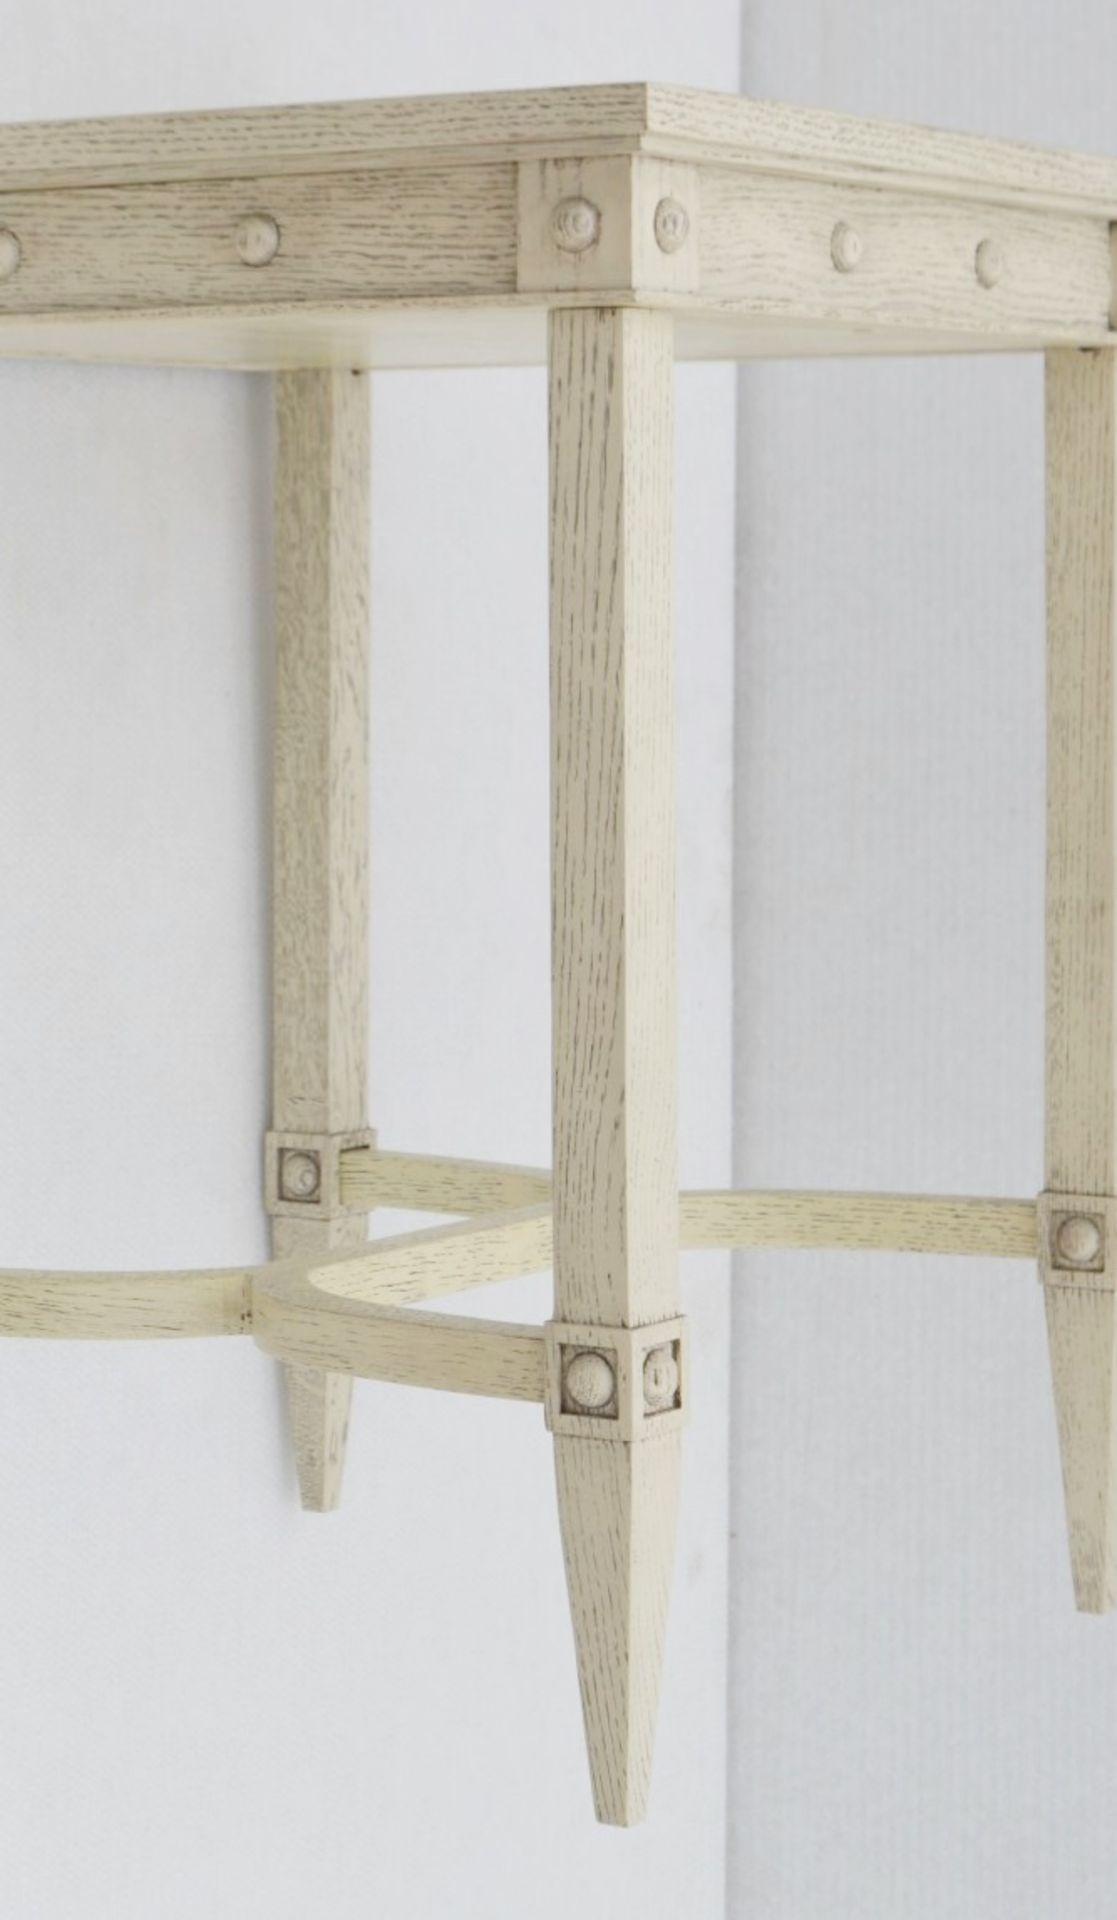 1 x JUSTIN VAN BREDA 'Thomas' Designer Georgian-inspired Table In Limed Grey Oak - RRP £1,320 - Image 6 of 6